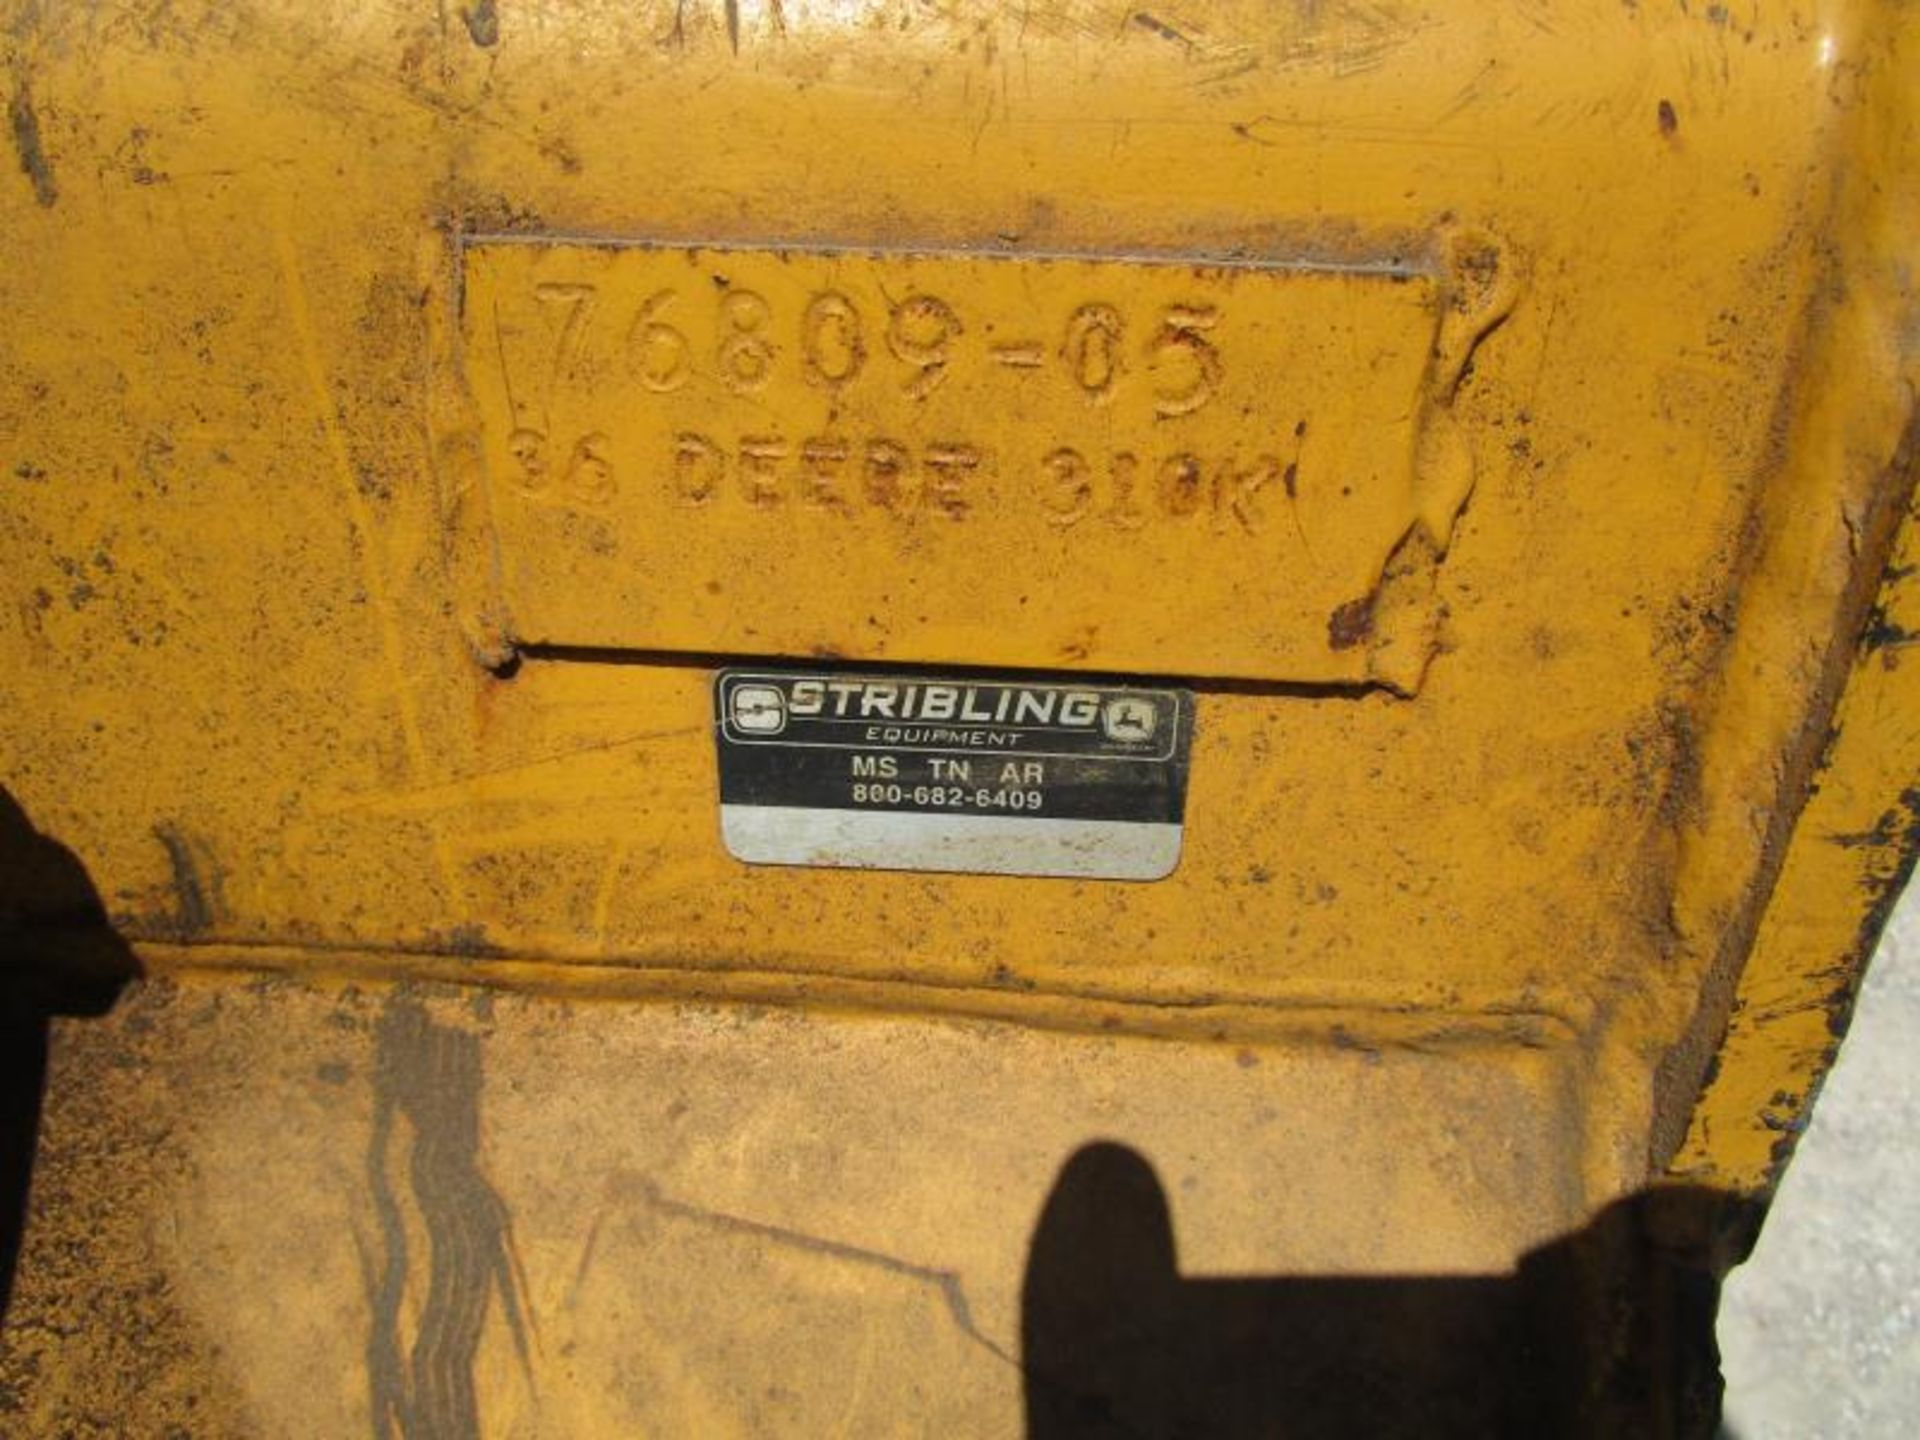 John Deere 410E, Turbo 4x4, 3,644 hours - Image 7 of 14